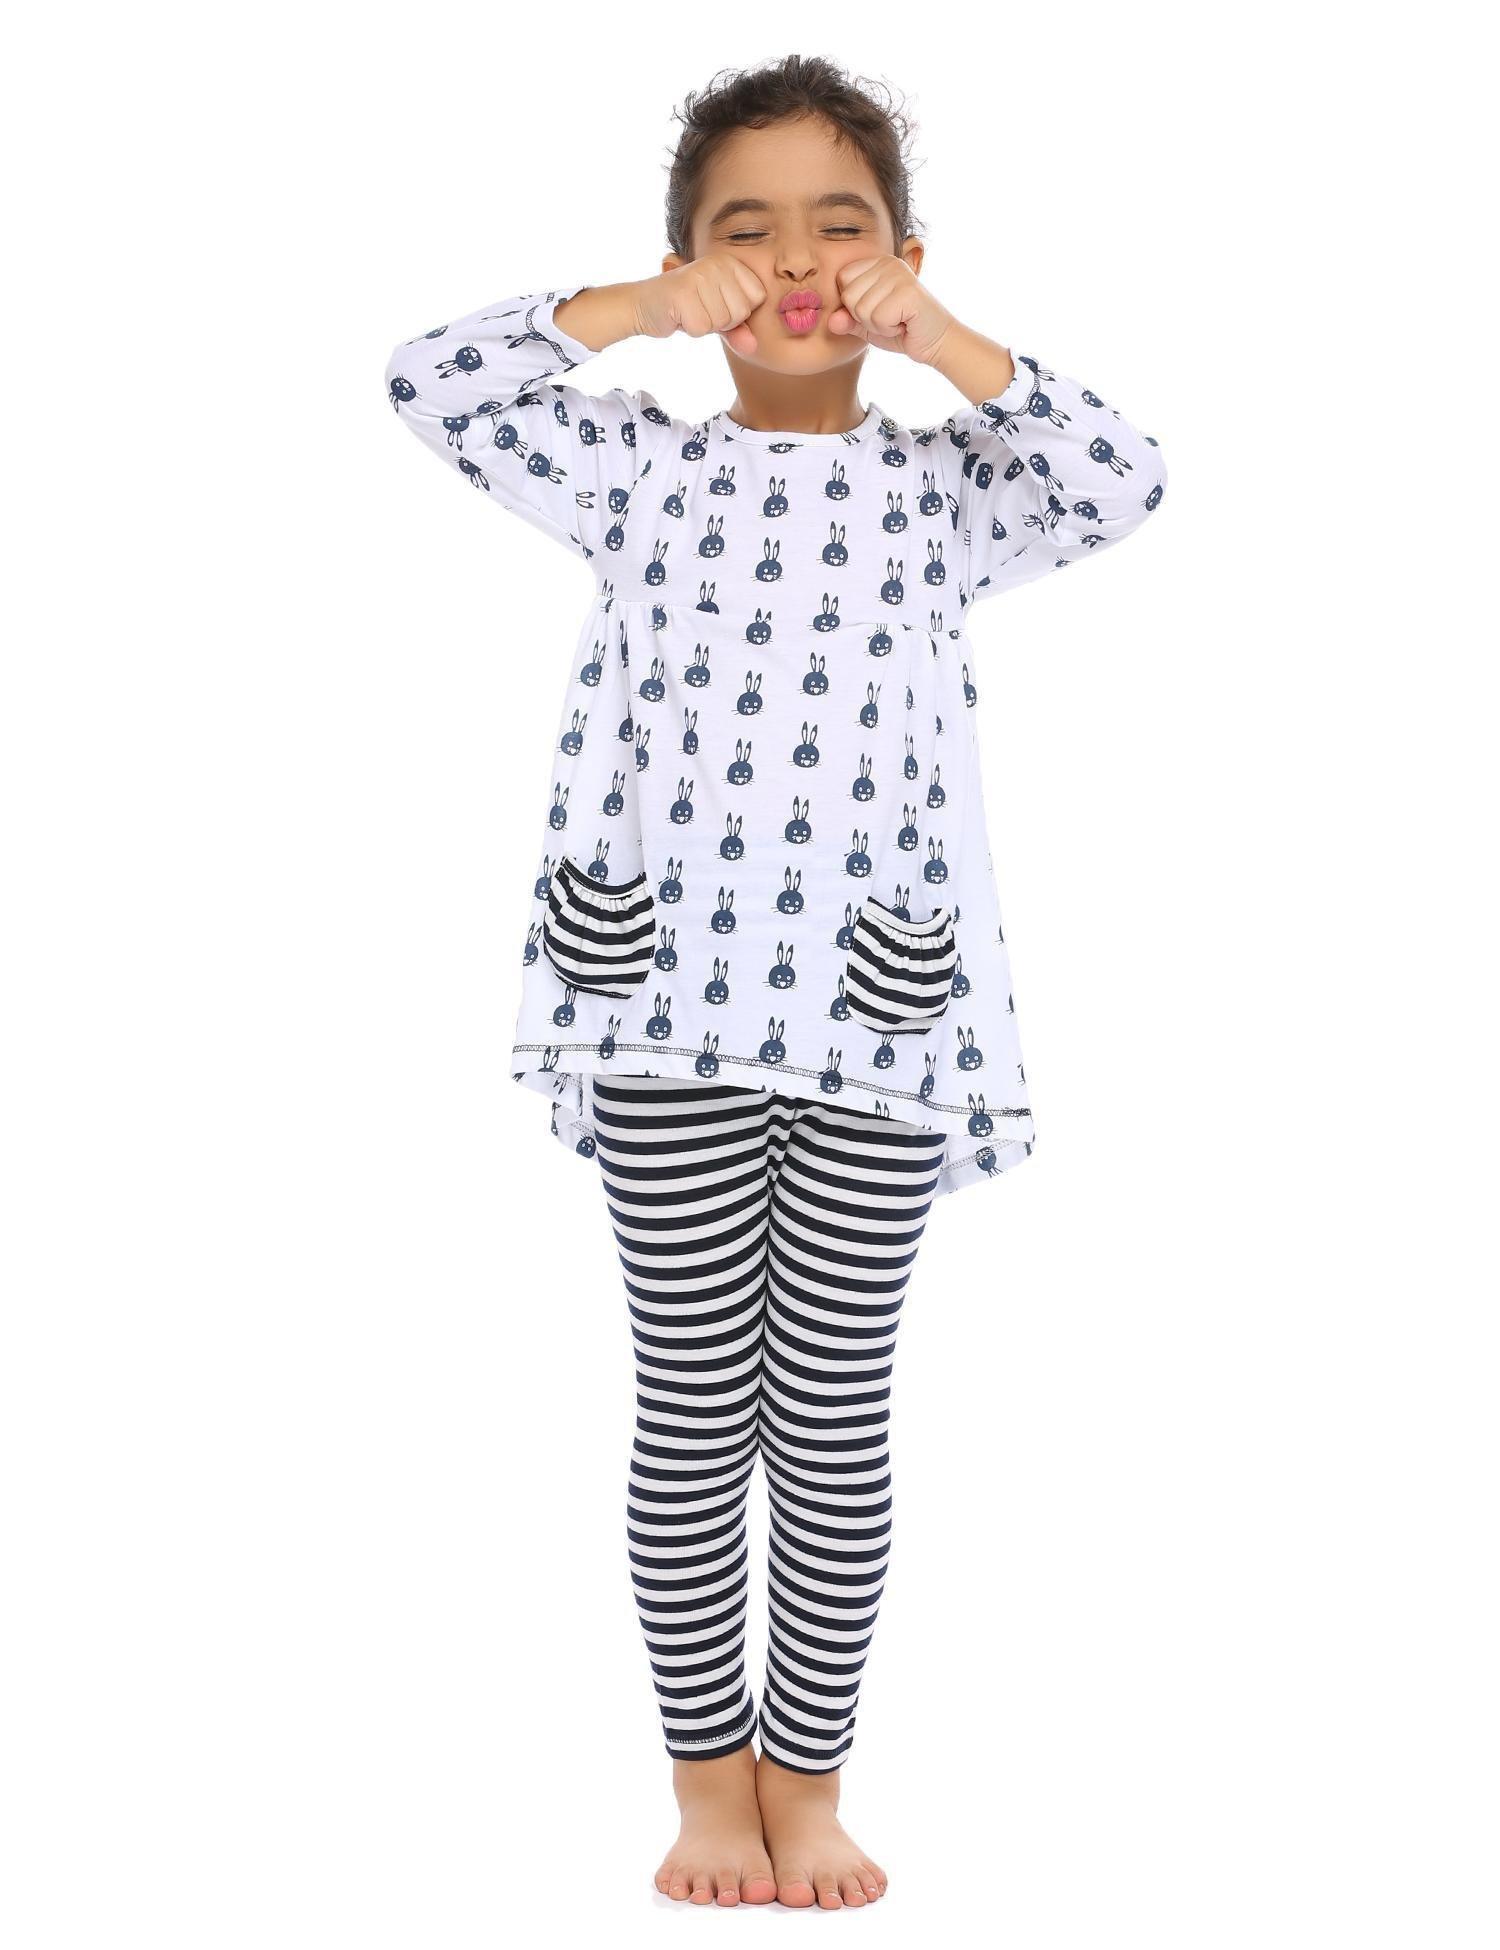 Balasha Girls Outfits Bunny Print 2PC Clothes Sets Top Leggings Sets Pockets